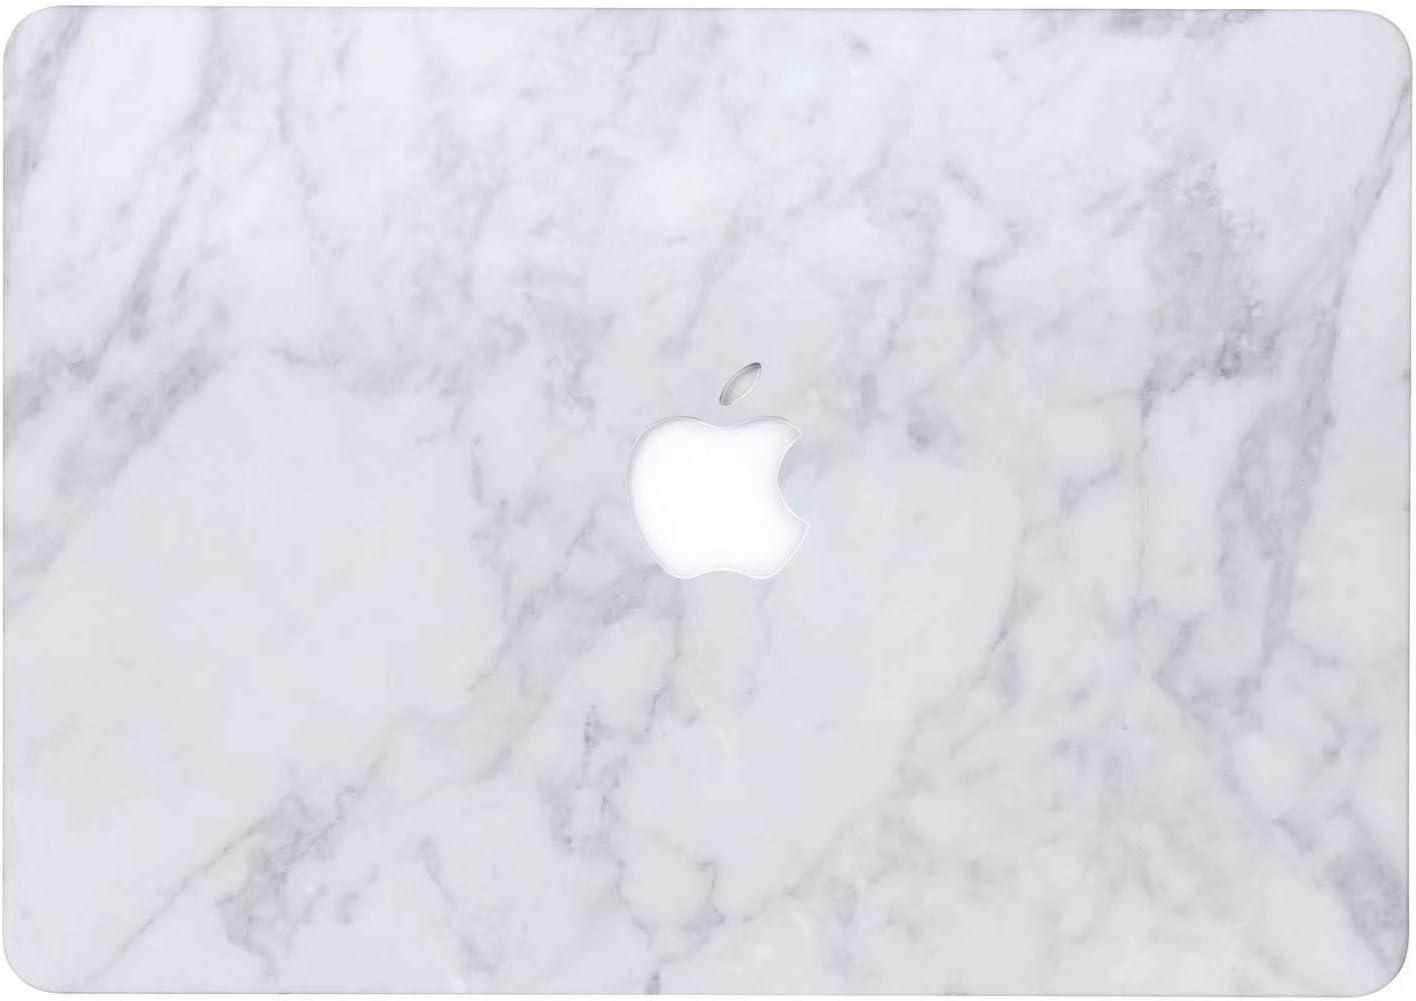 Hard Case for MacBook 12 inch Retina Model A1534, AQYLQ Matt Plastic Hard Protective Shell Cover Case for Apple MacBook 12